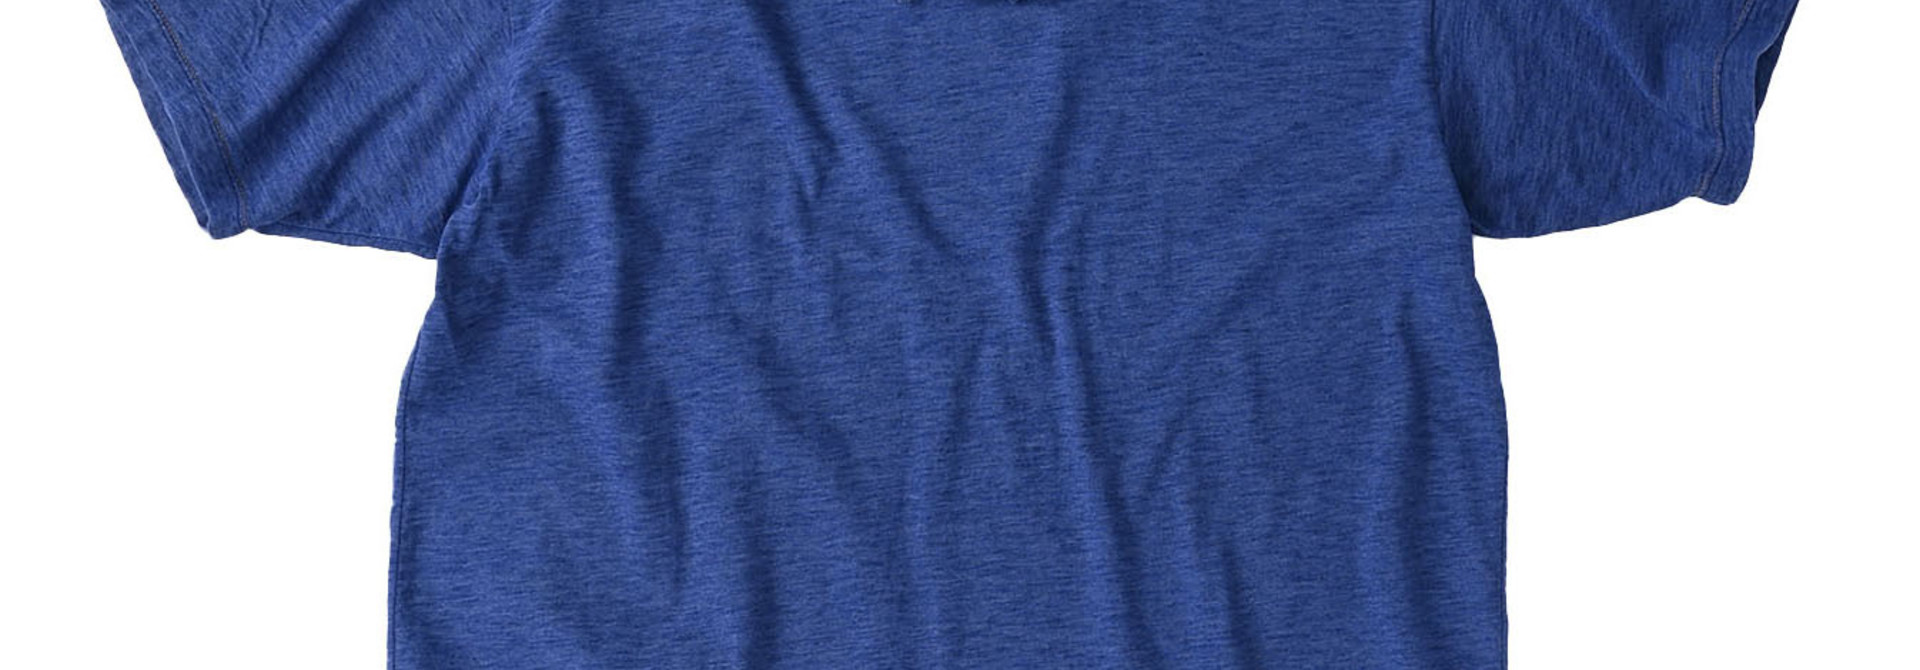 Indigo Tenjiku Lei Frill Ocean T-shirt (0621)